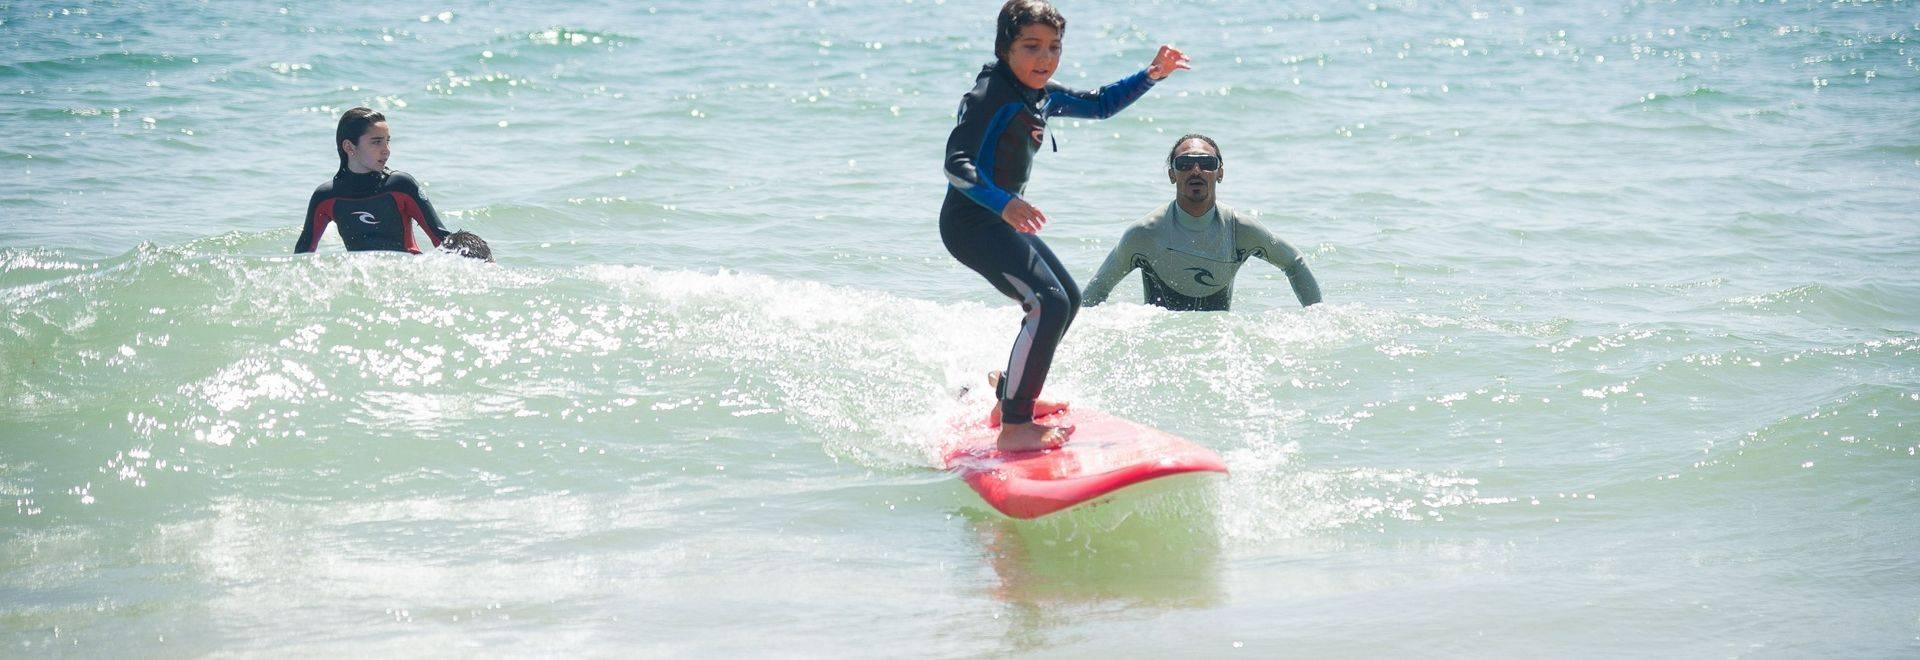 Paradis-Plage-kid-surfing.jpg